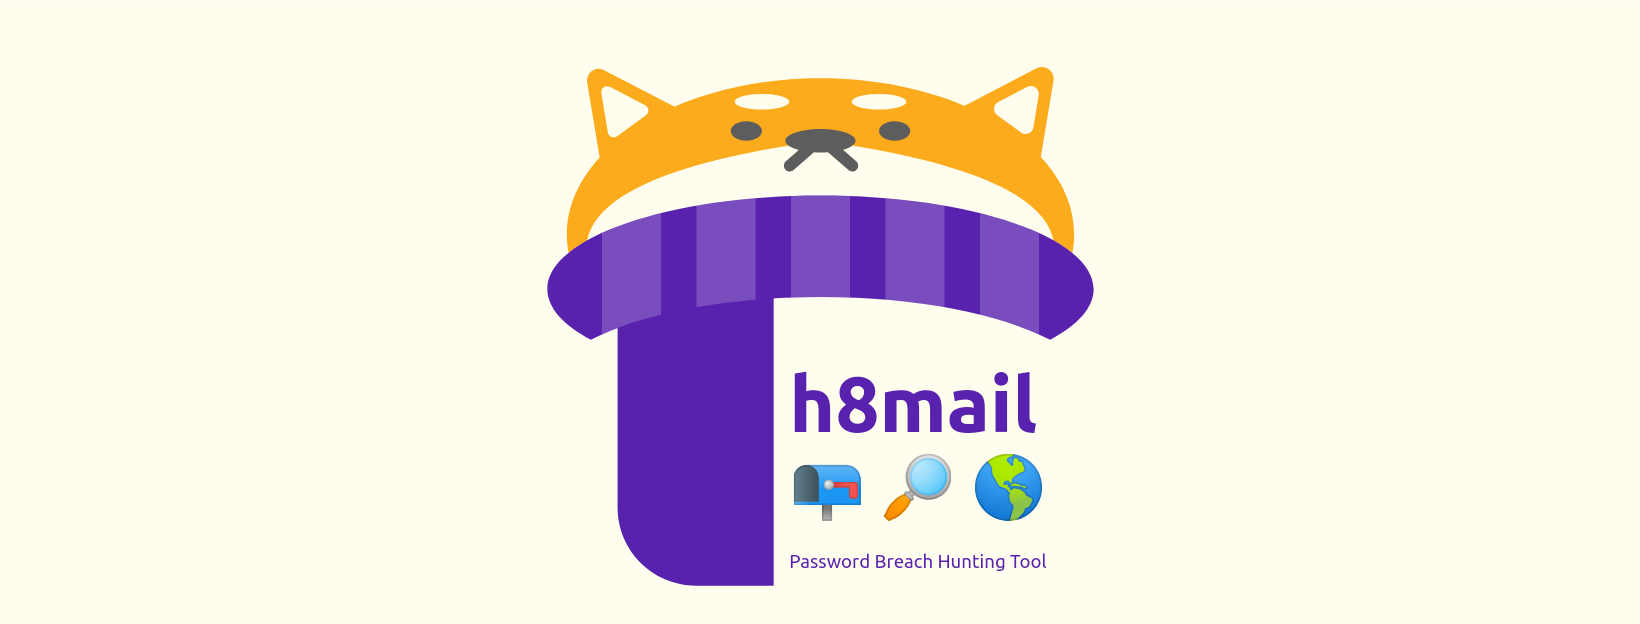 h8mail